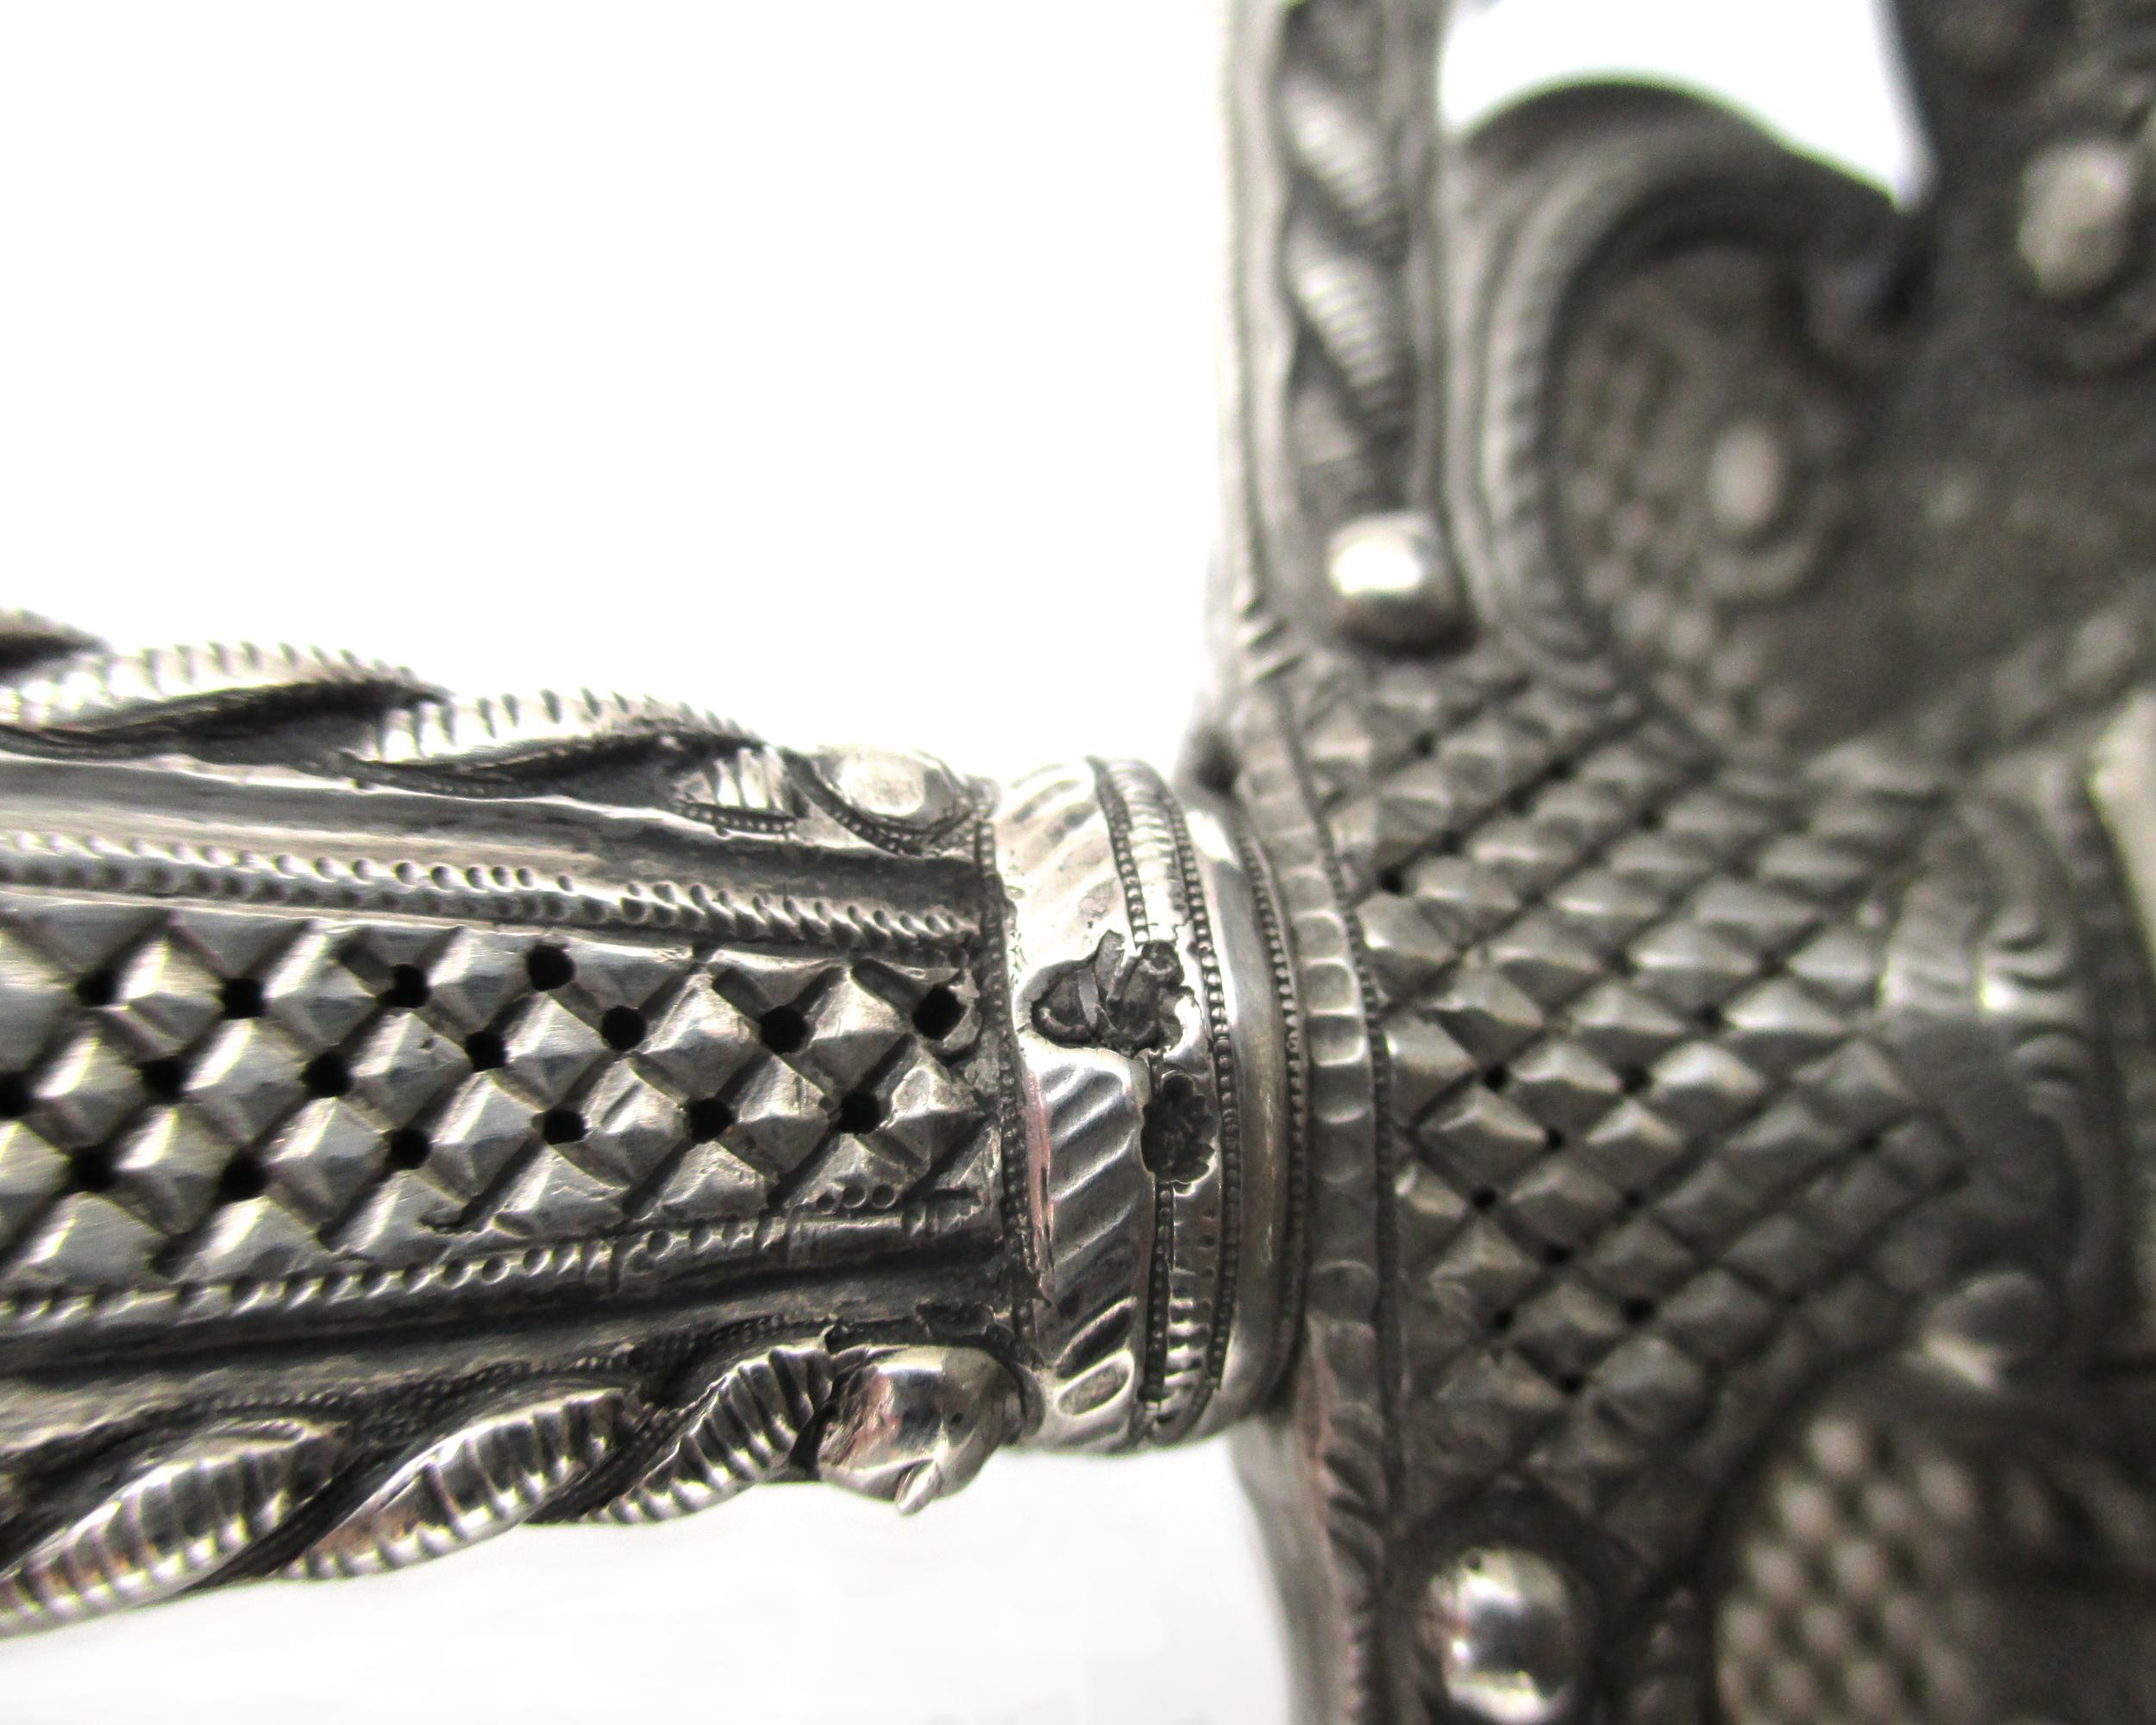 french-silver-hilt-sword-weapon-18thcentury-gary-friedland-arms-armor-5.jpg